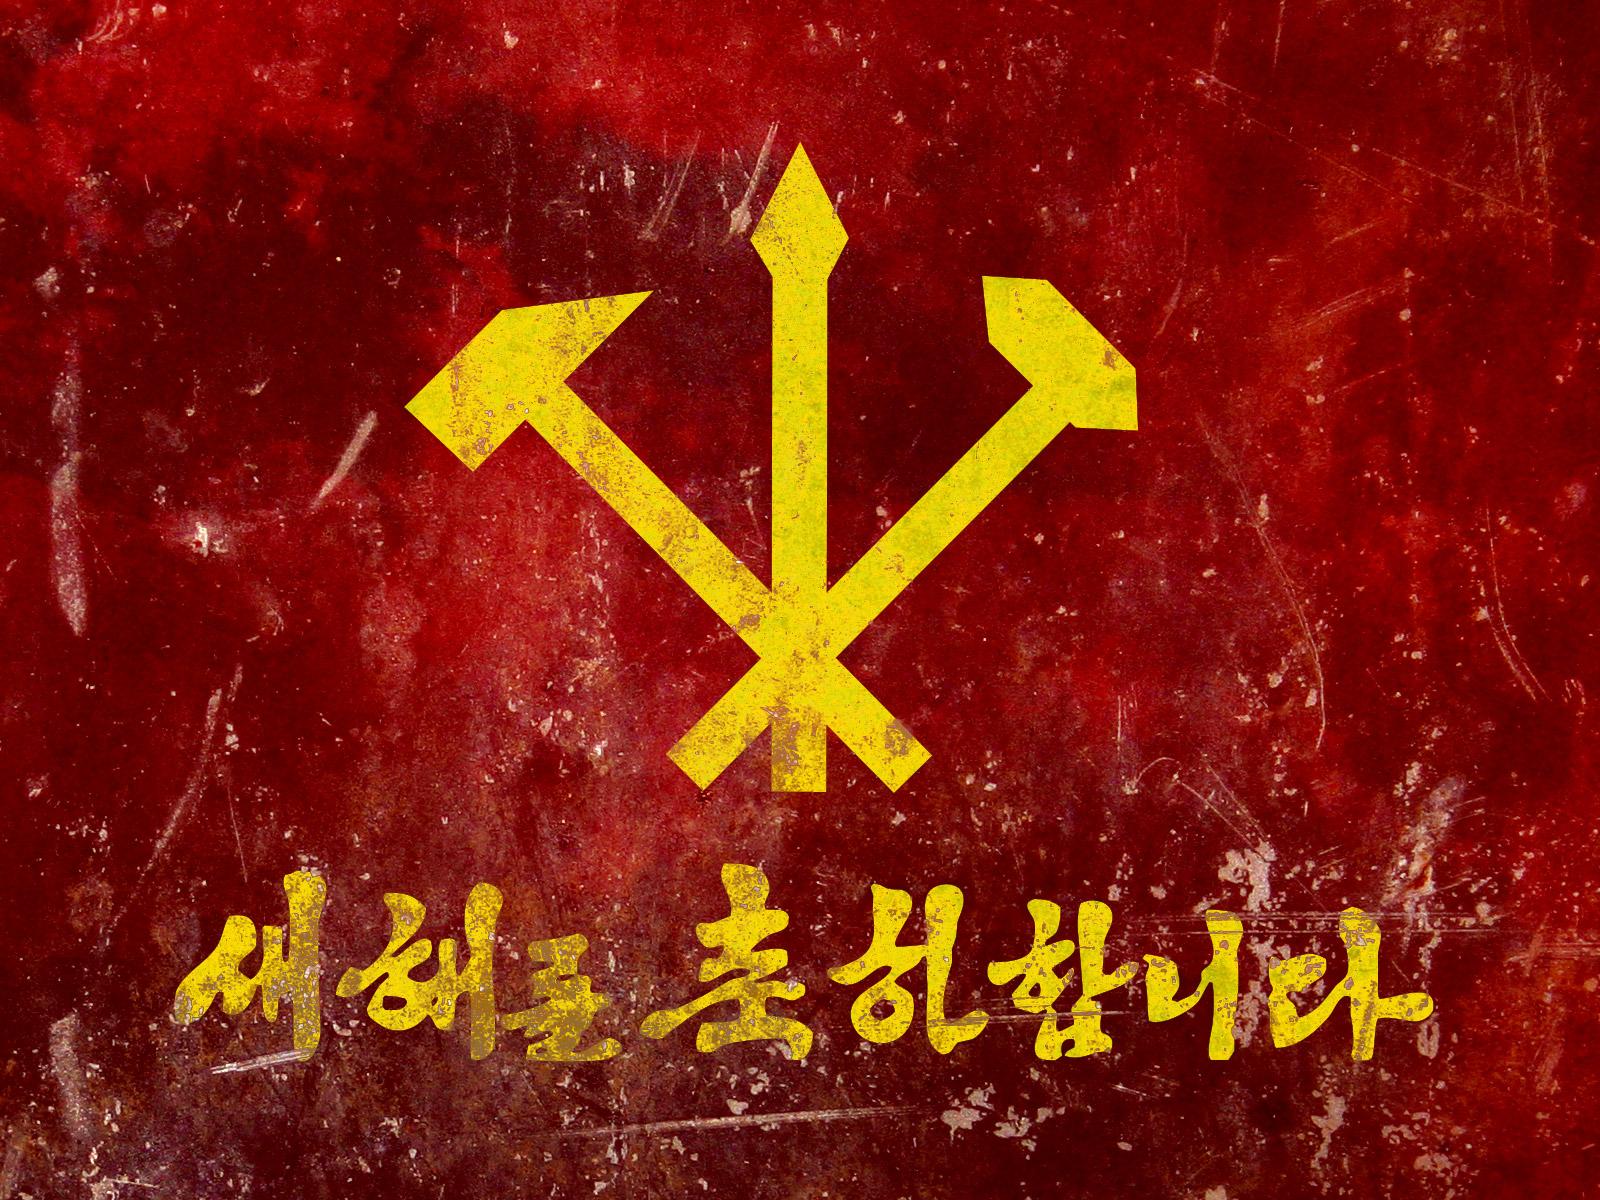 Communism Wallpaper And Background Image North Korea Communist